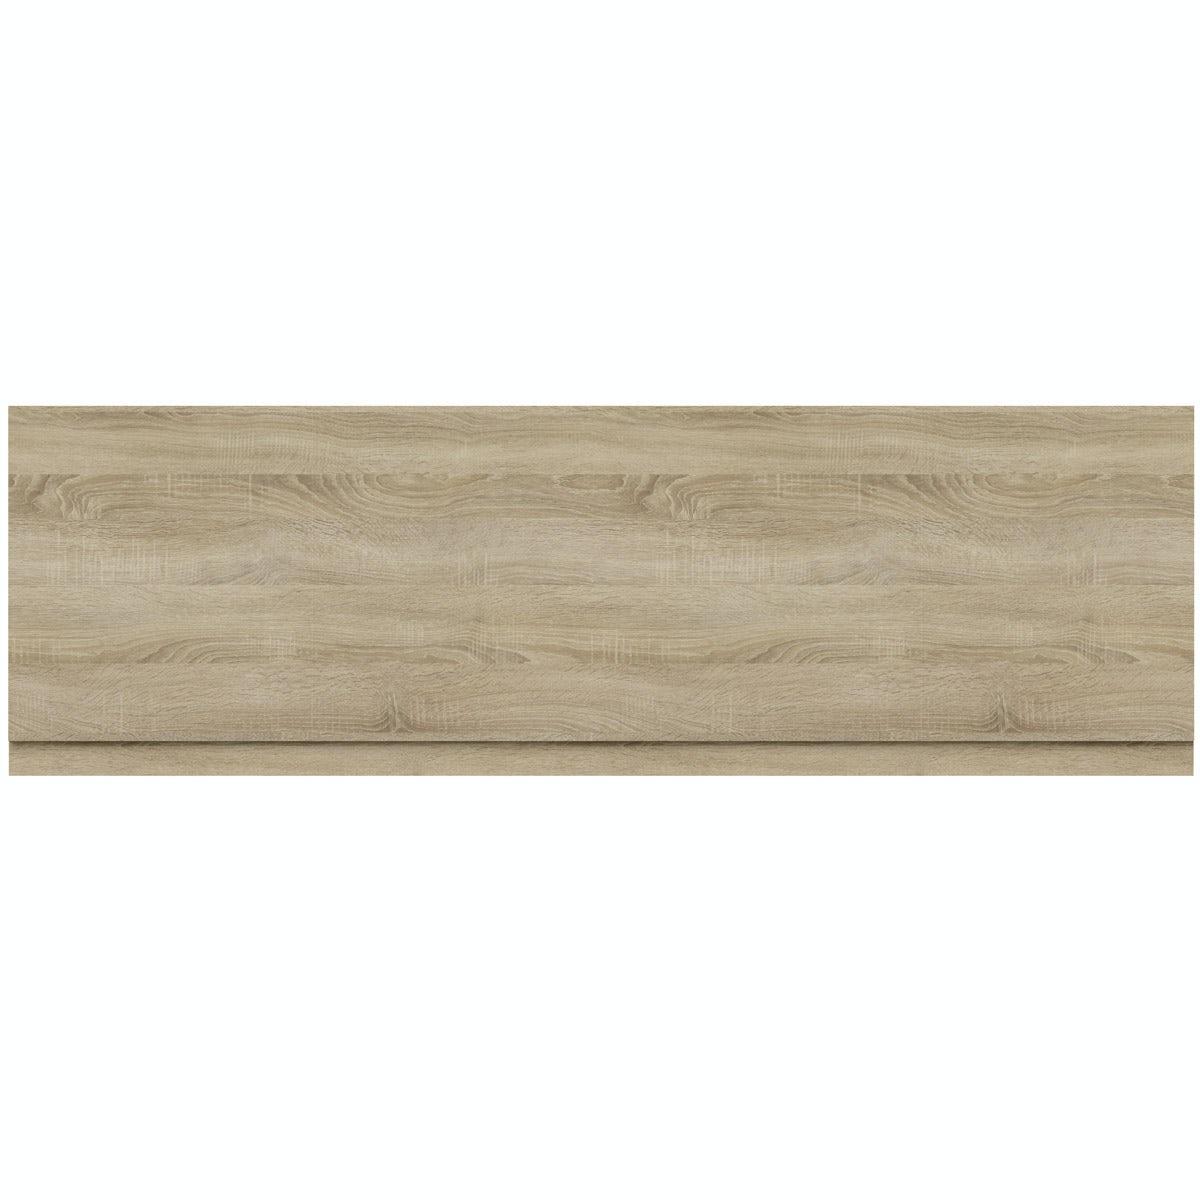 Orchard Wye oak bath front panel 1700mm